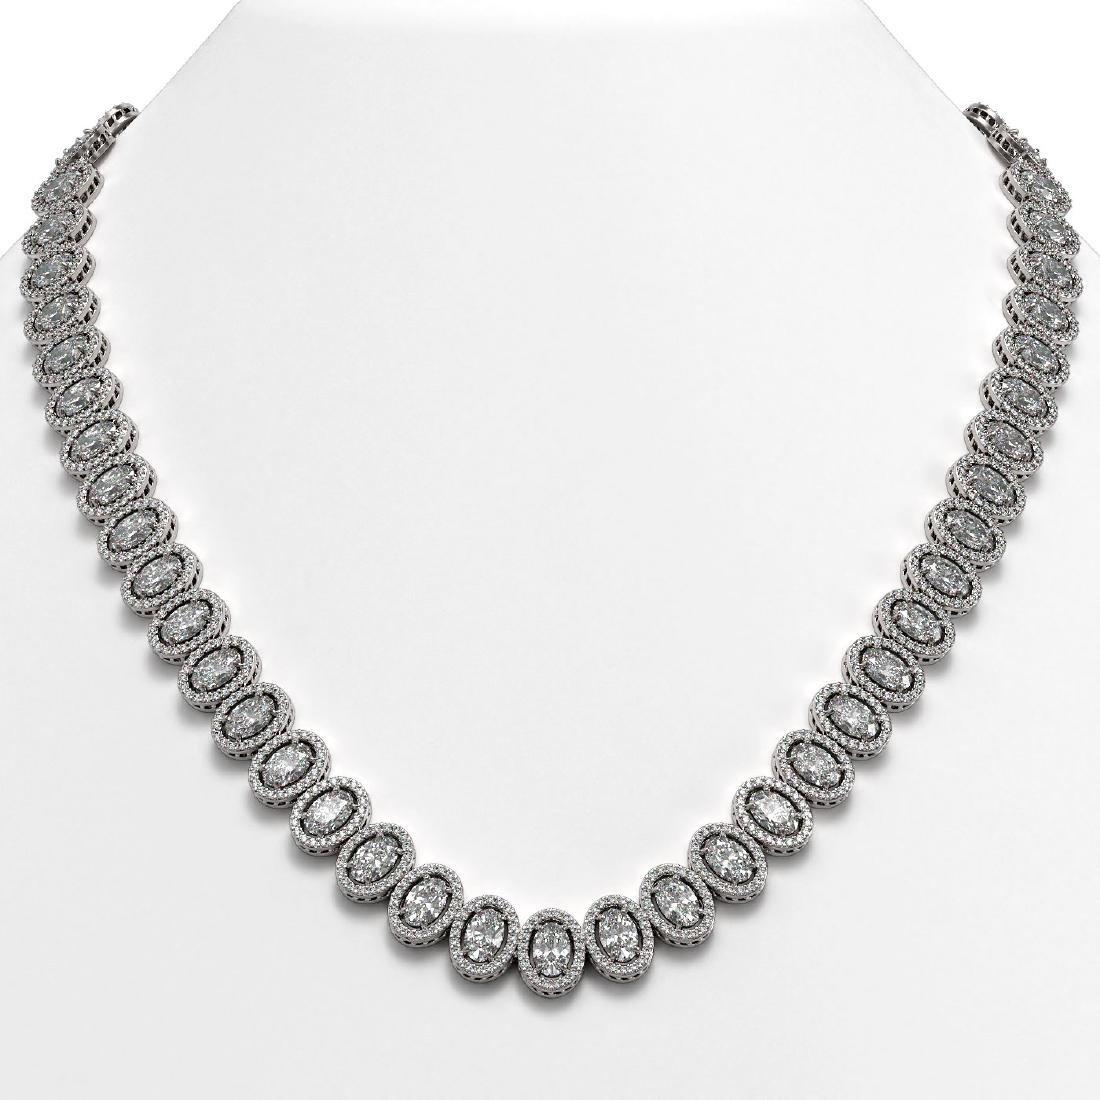 42.56 CTW Oval Diamond Designer Necklace 18K White Gold